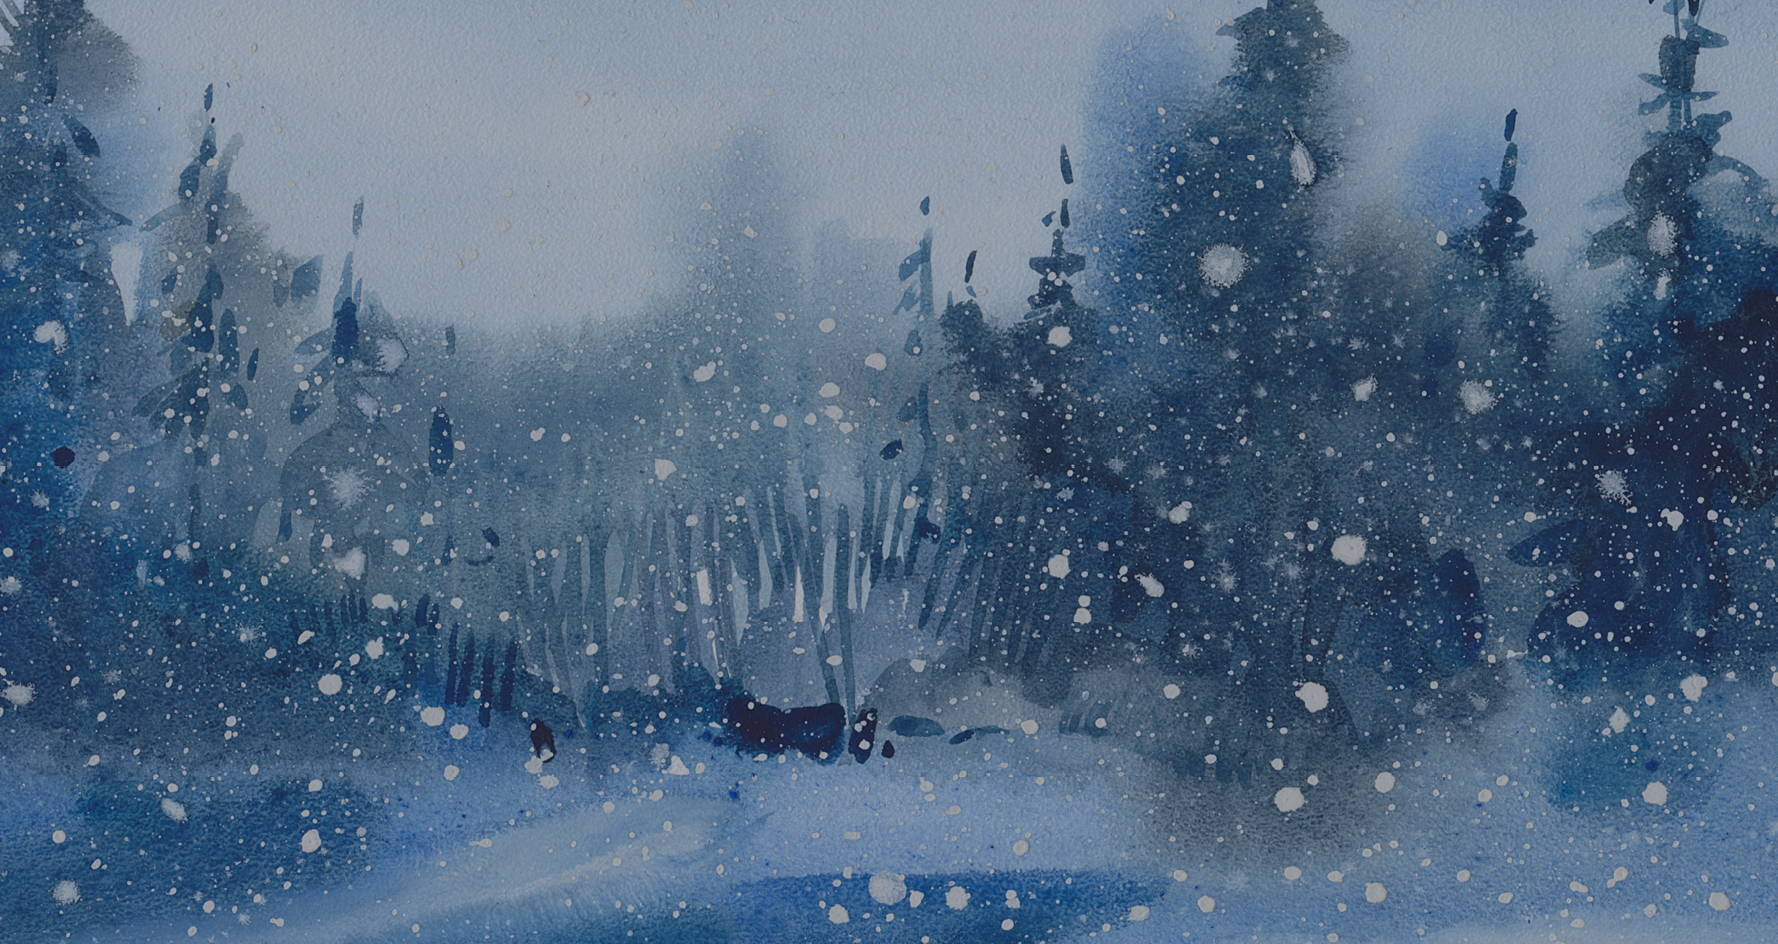 Watercolor tree and snow scene